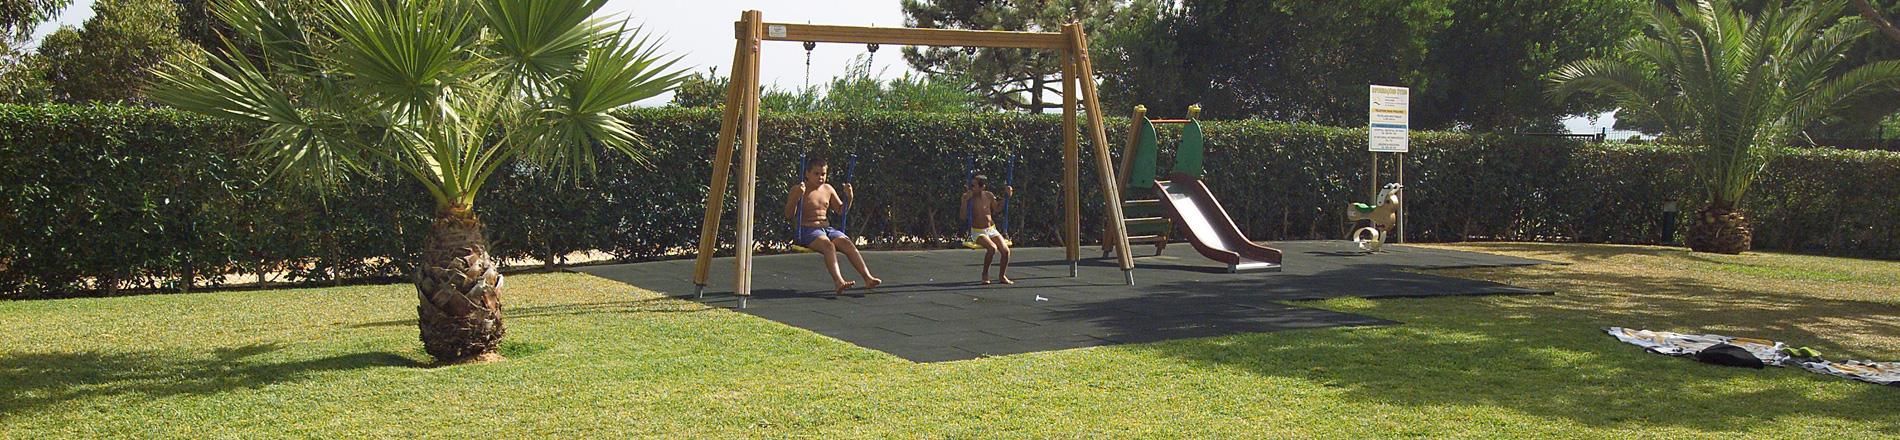 Jardim infantil